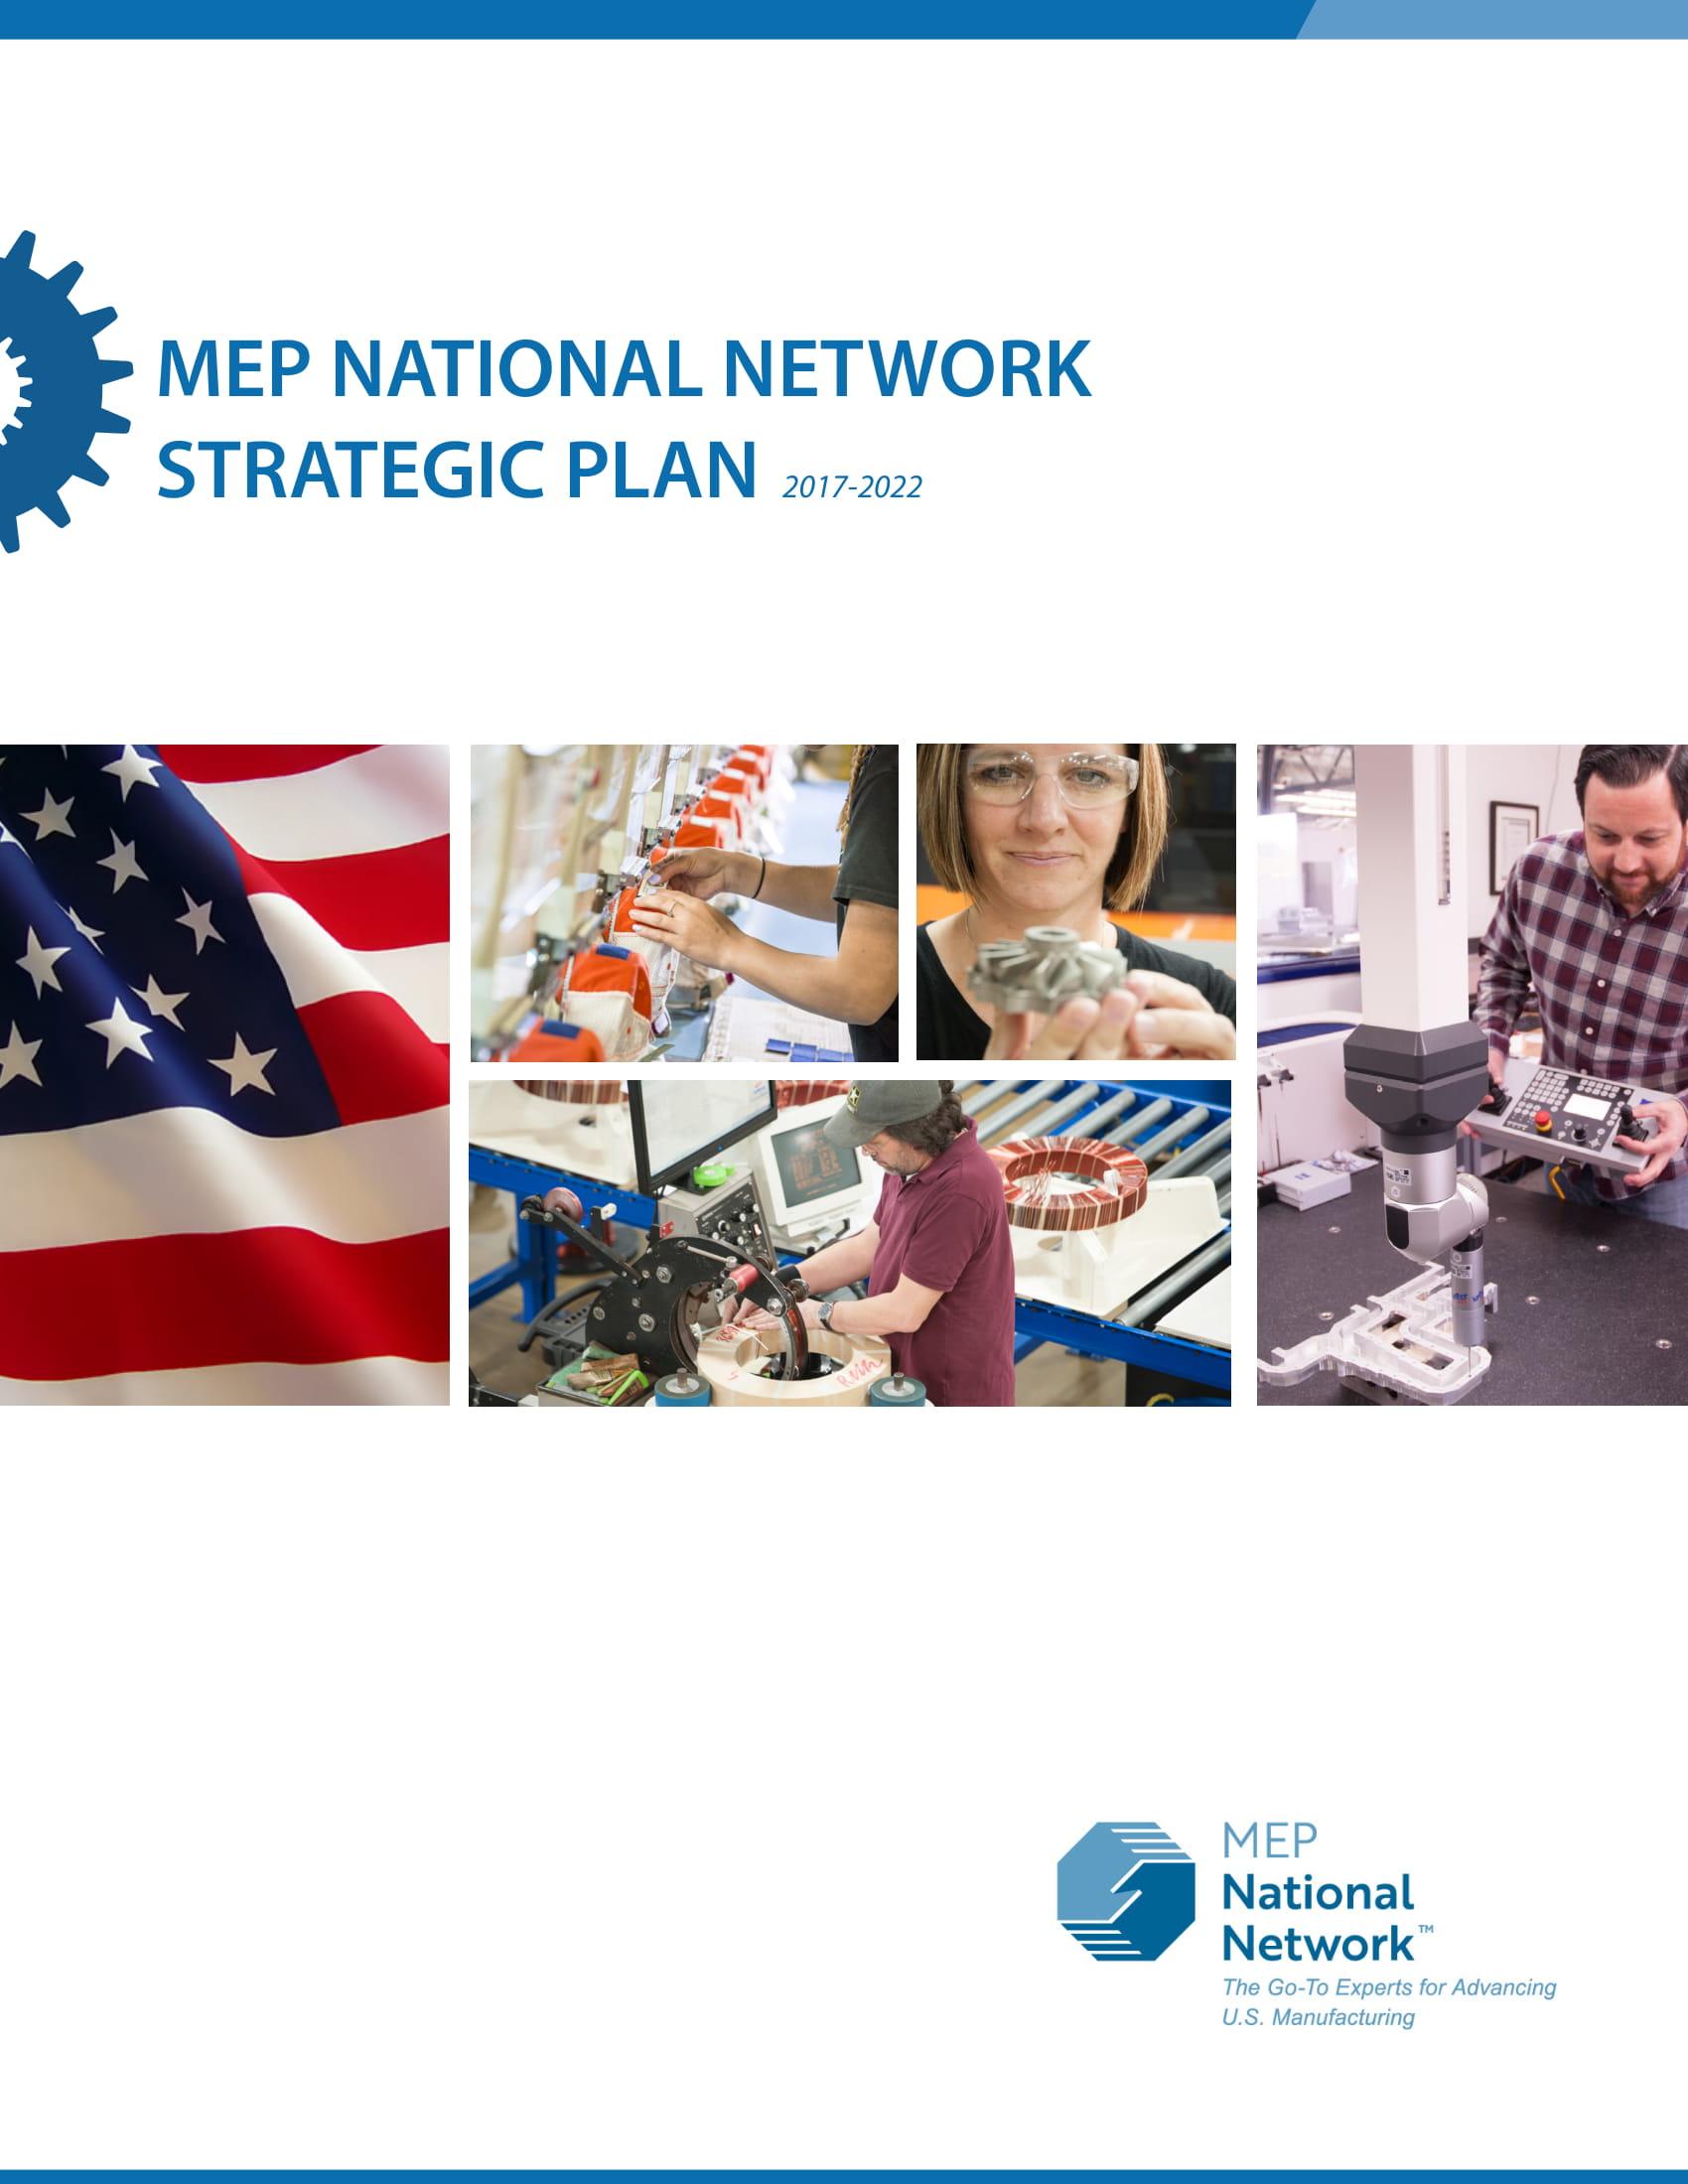 national network strategic plan example